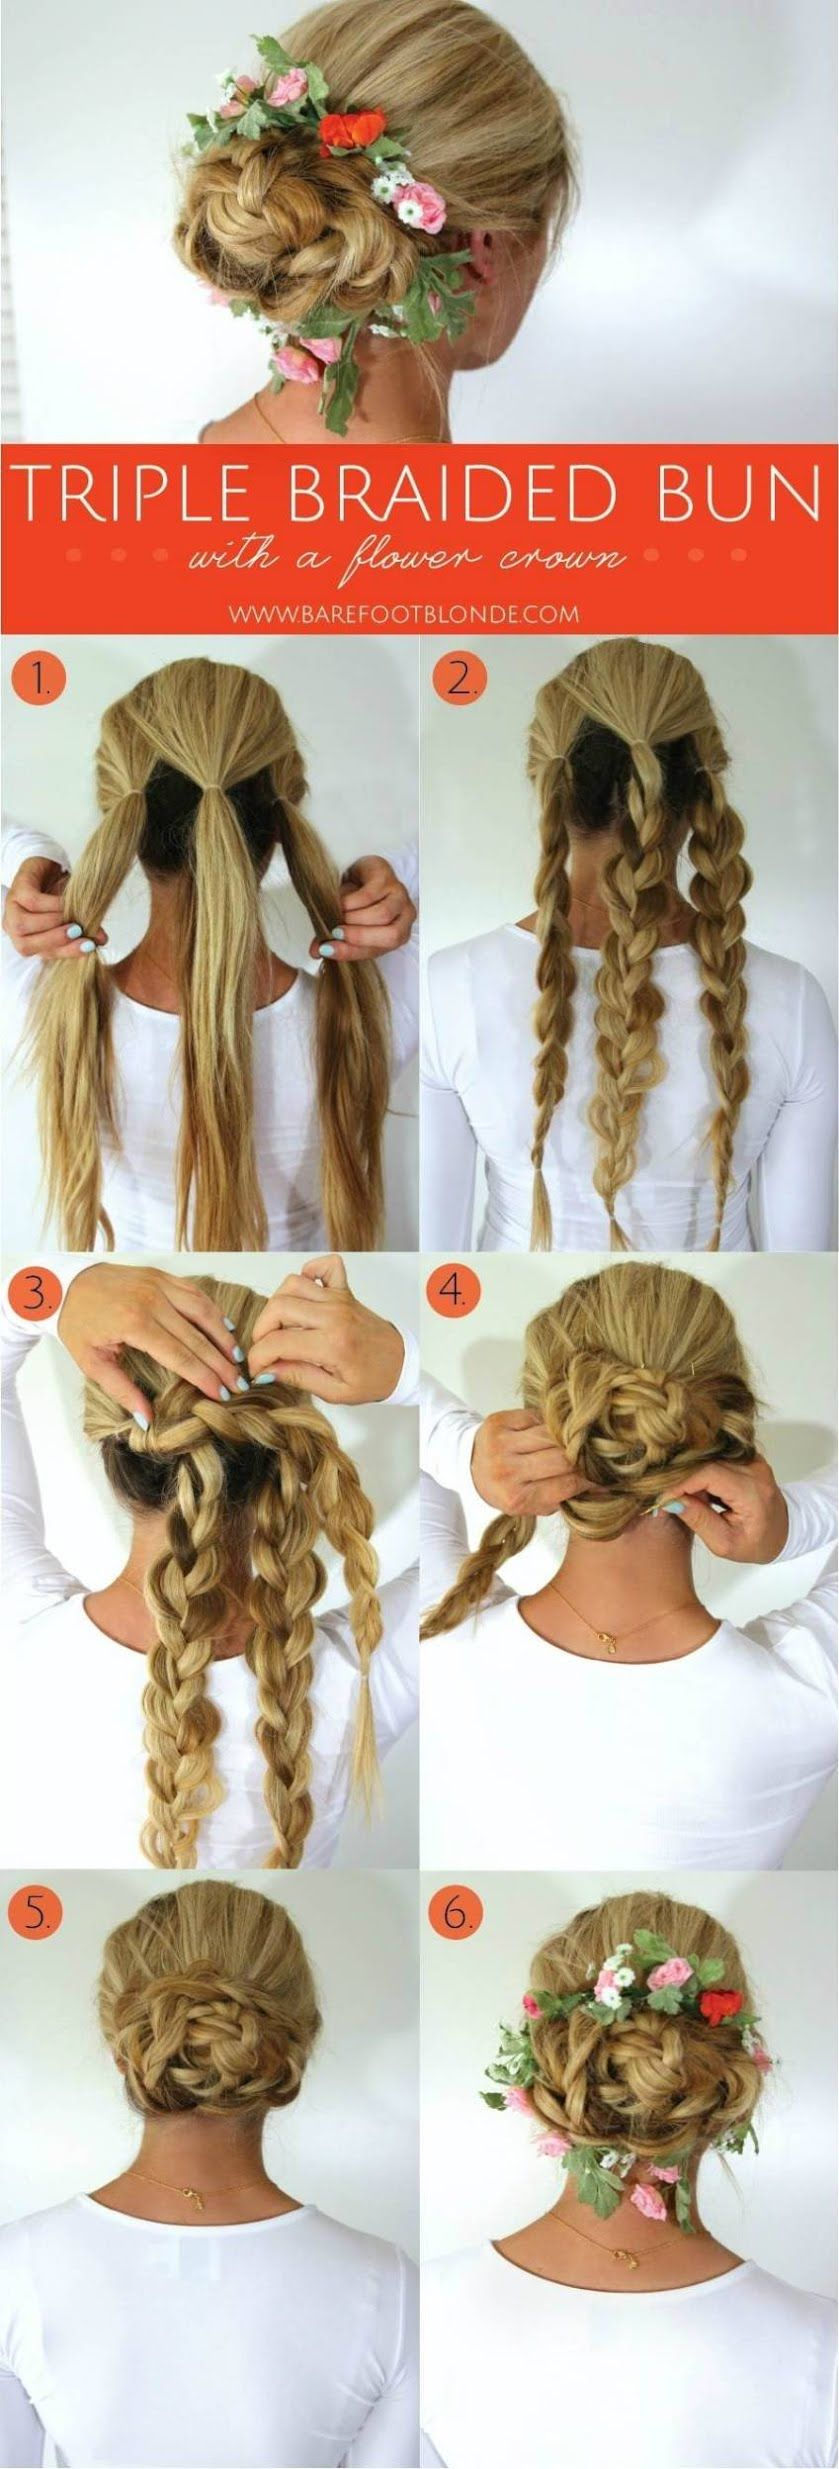 Braid prom hairstyles for long hair braid updo for short hair